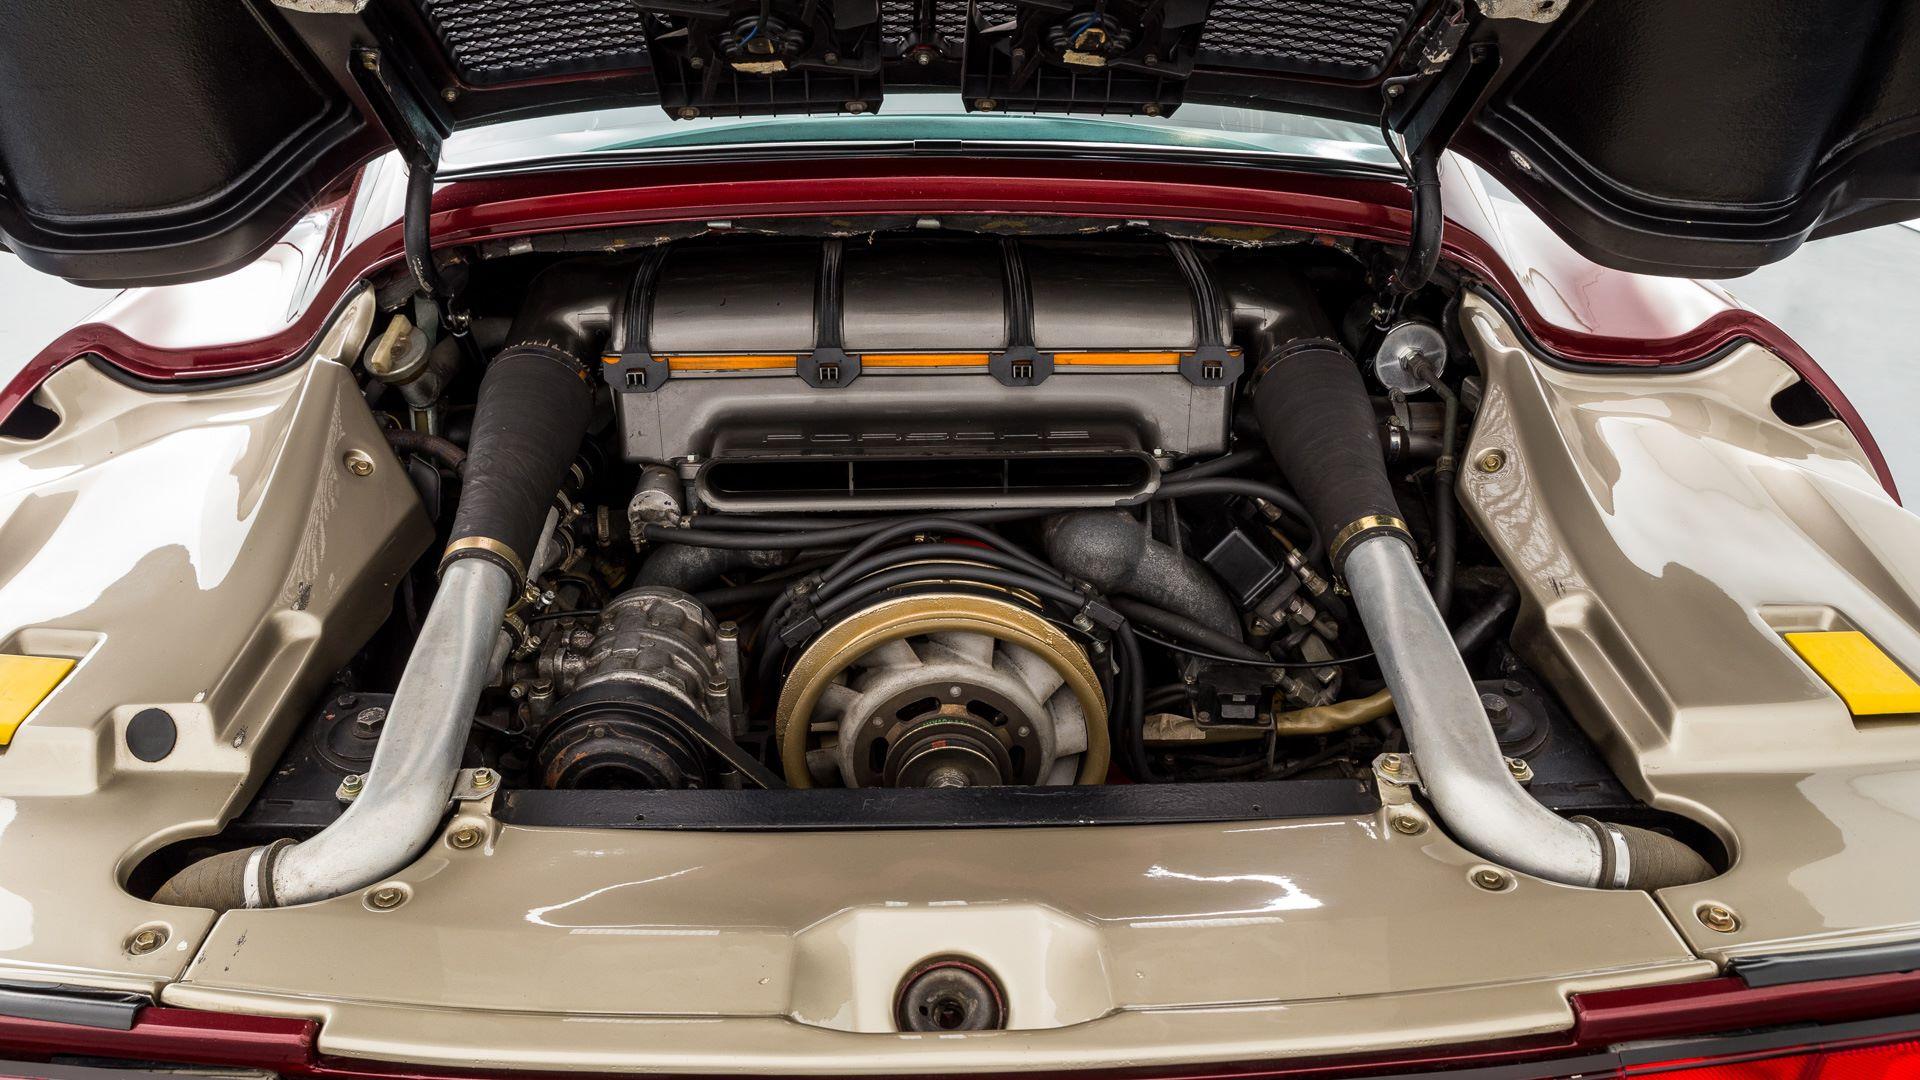 Porsche-959-Prototype-1985-for-sale-17